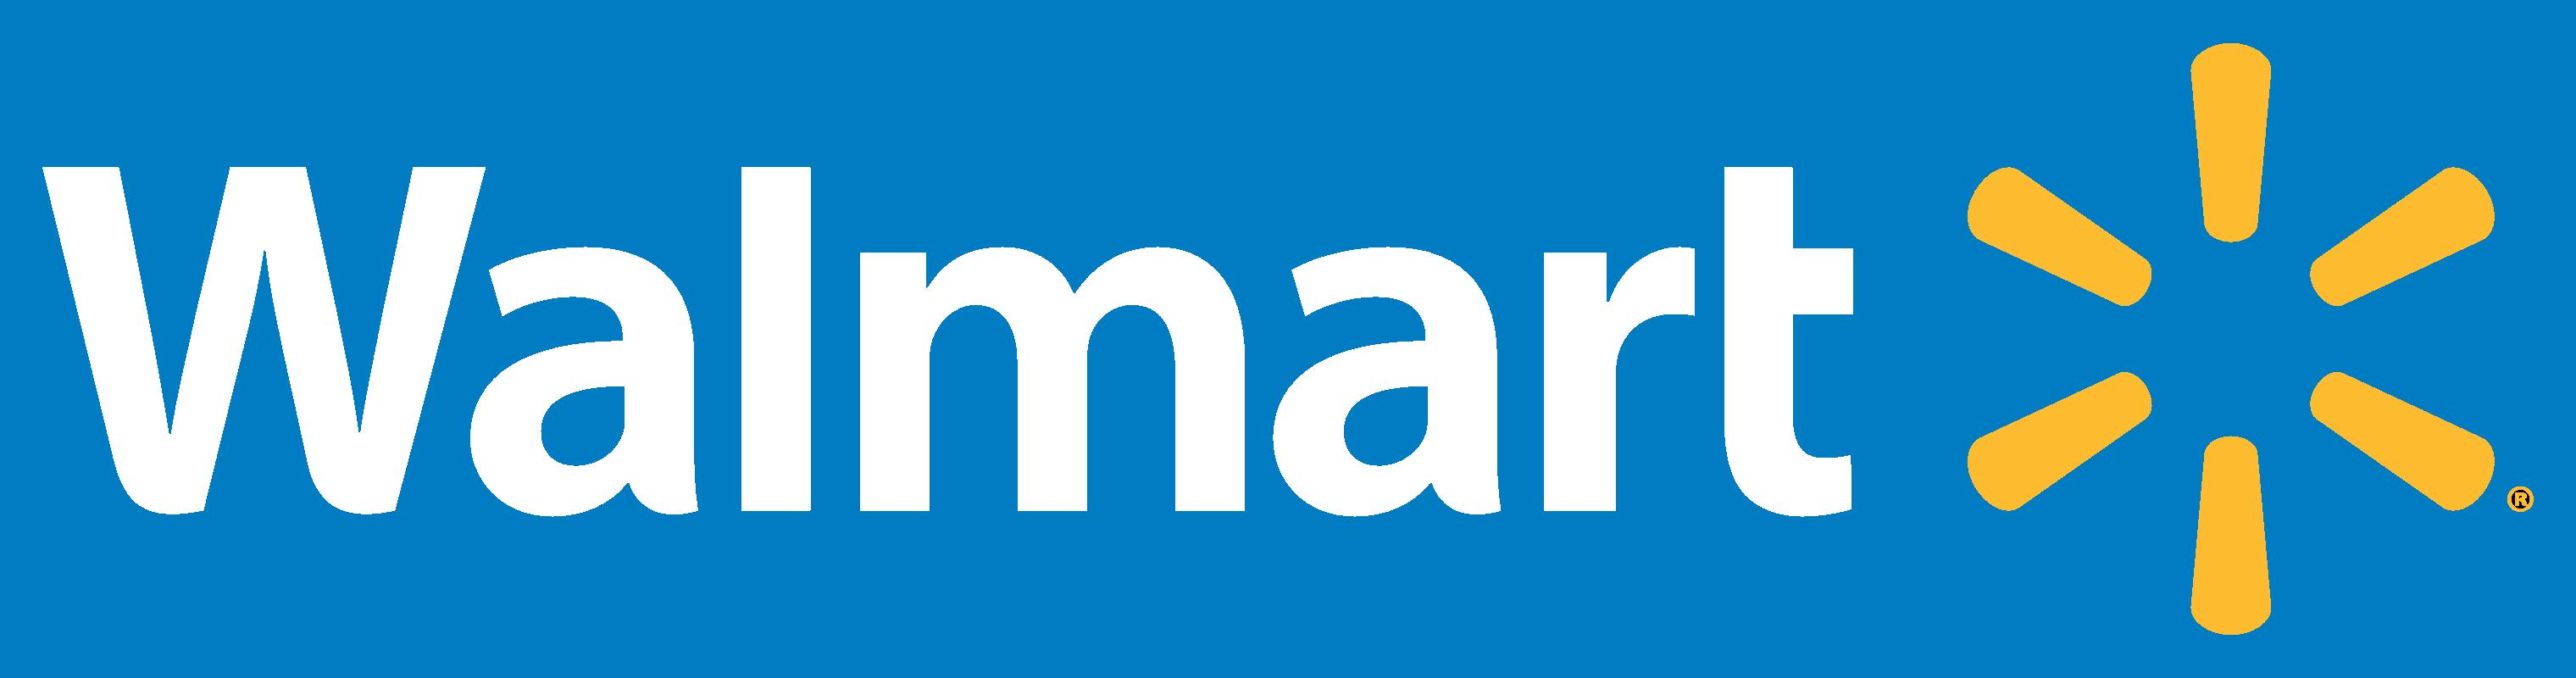 Walmart_logo_transparent_png_blue